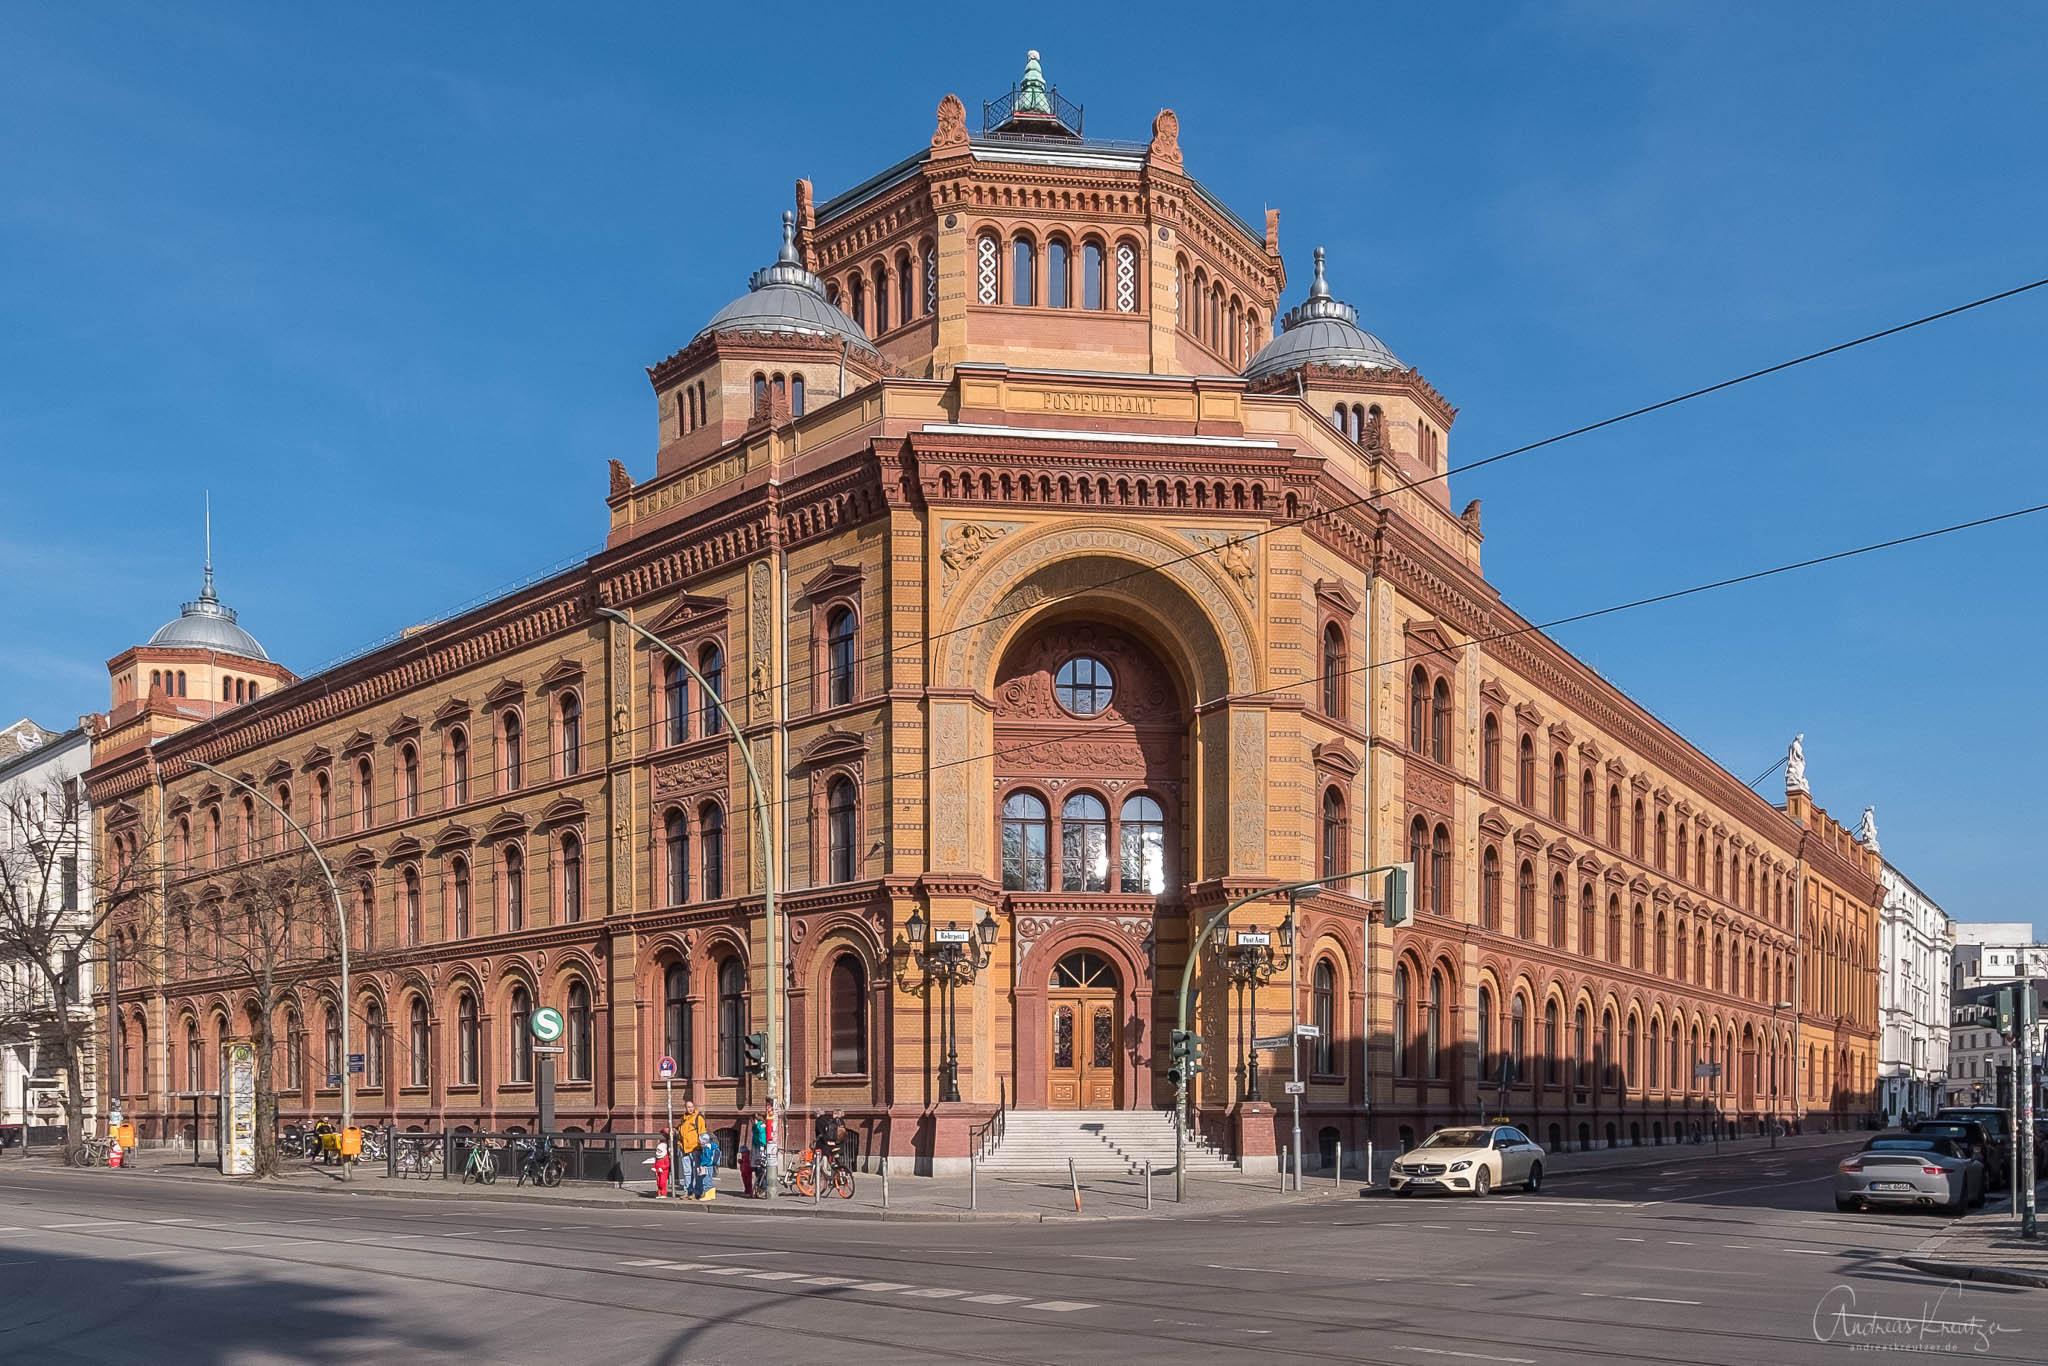 Postfuhramt